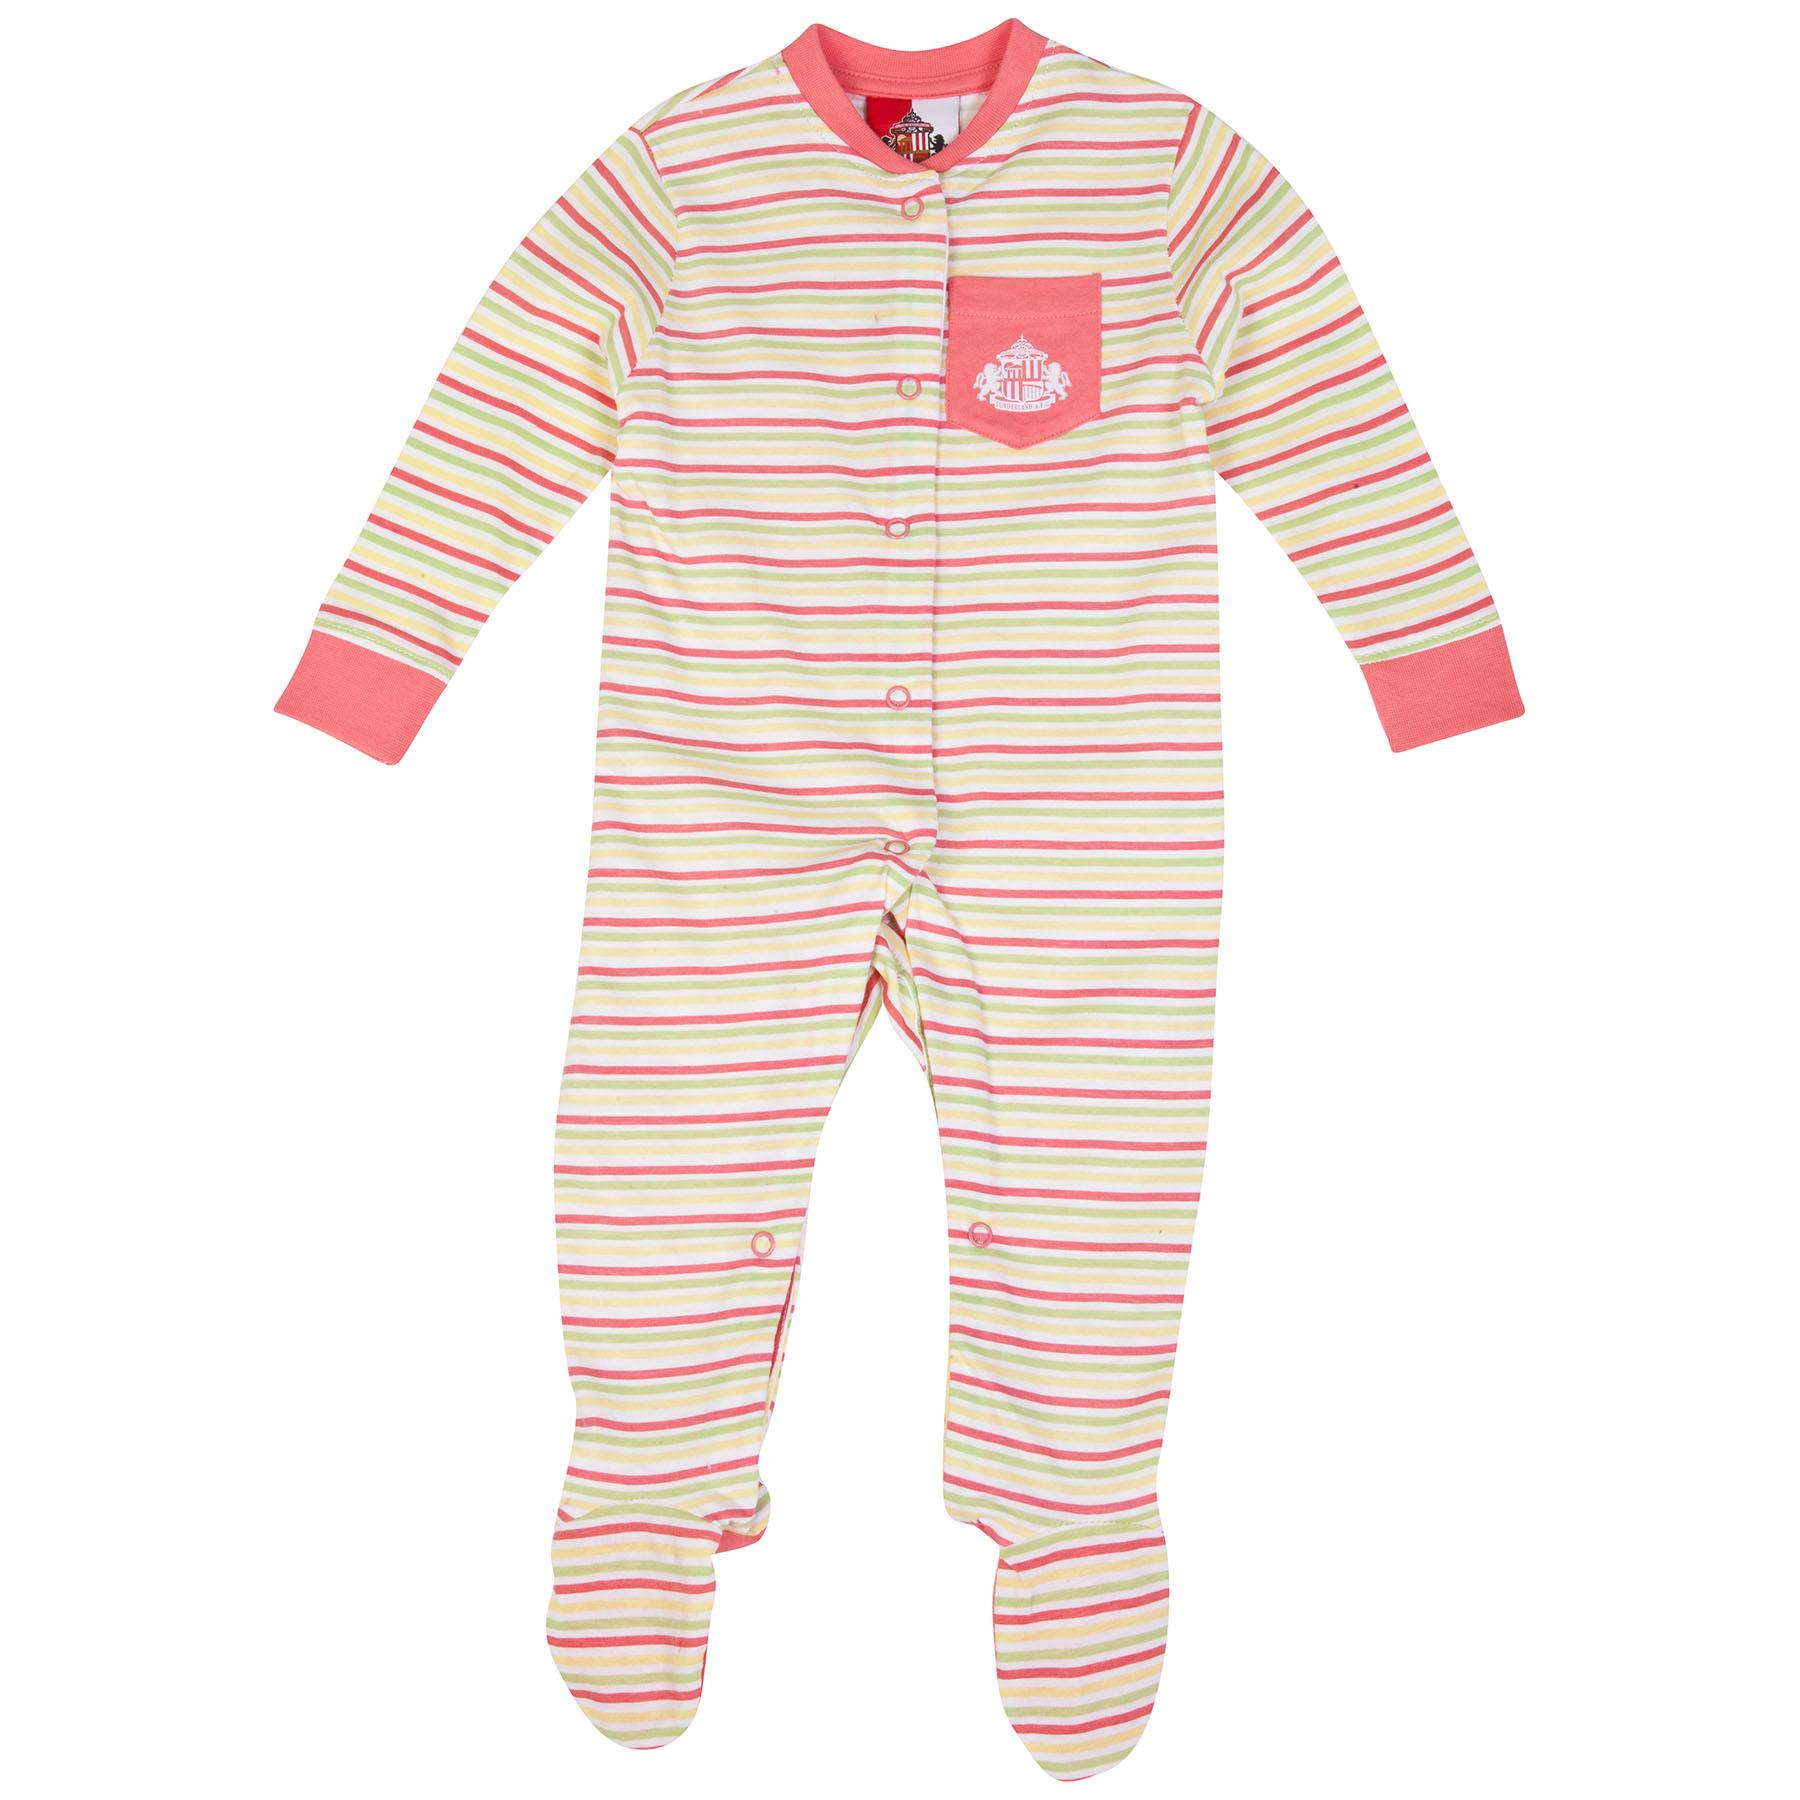 Sunderland Lila Sleepsuit-Baby Pink